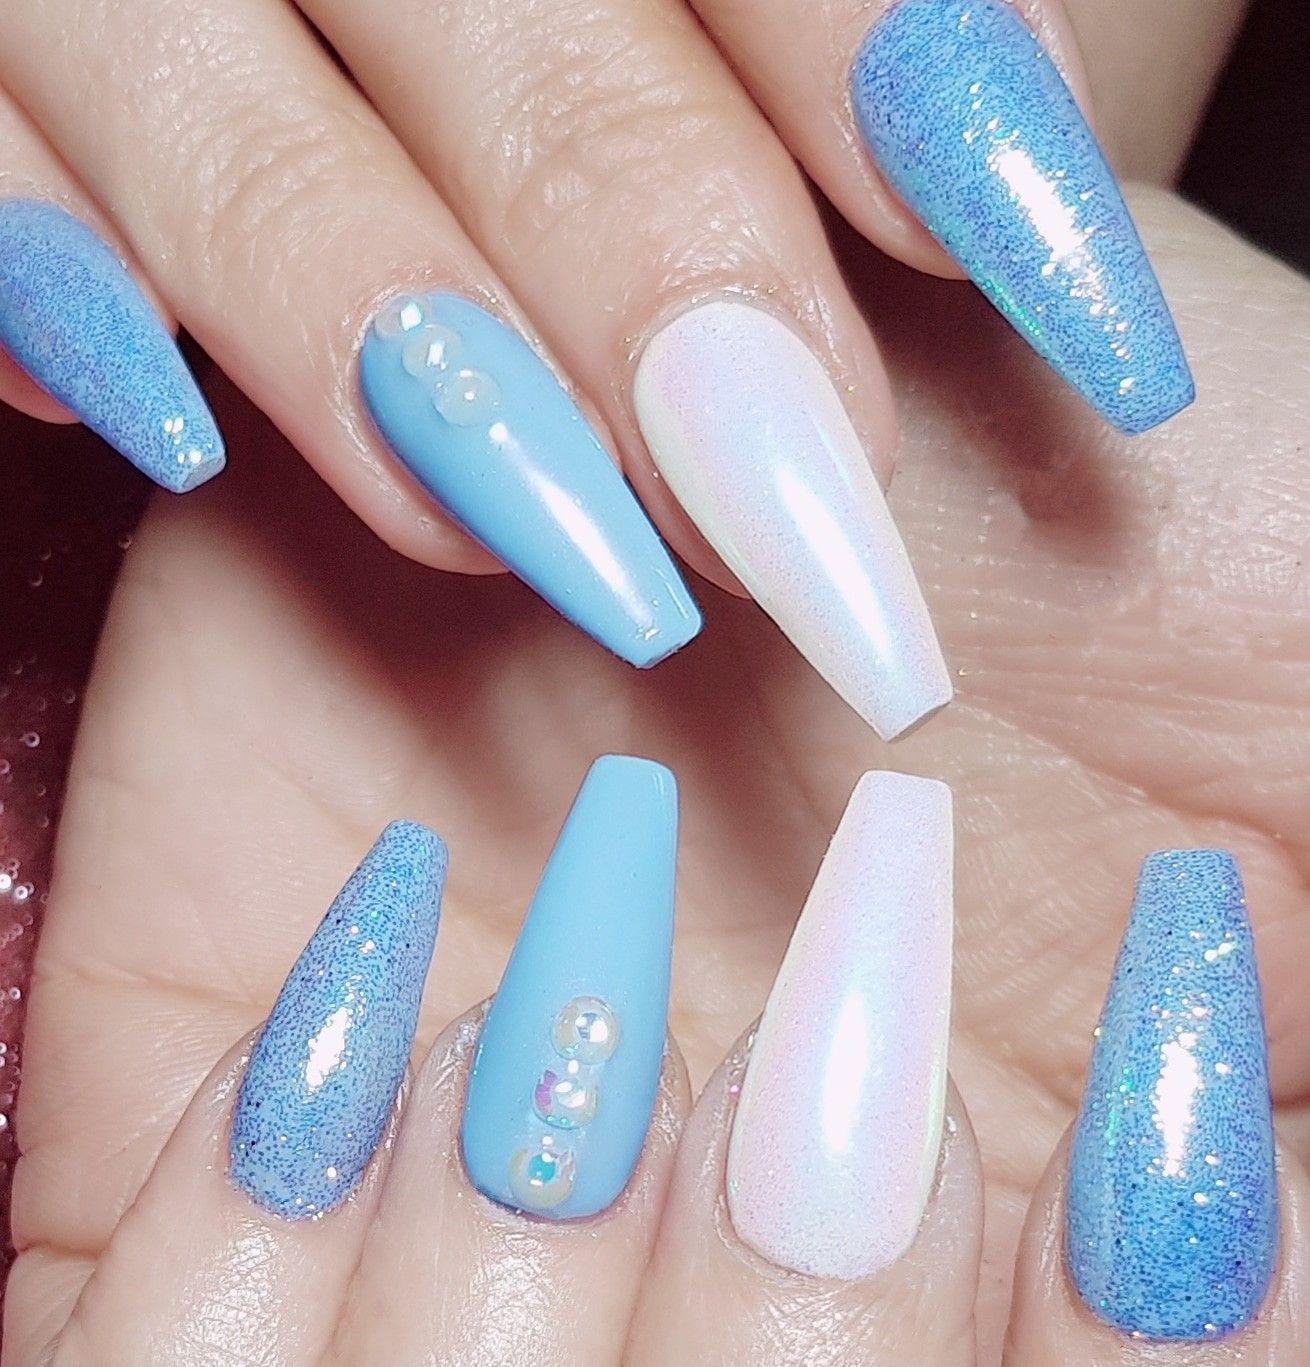 Efh 8eodwra On Instagram Blue Pastel With Dry Multicoloured Glitter Gel Matte Blue Coffin Nails Blue Acrylic Nails Coffin Nails Glitter